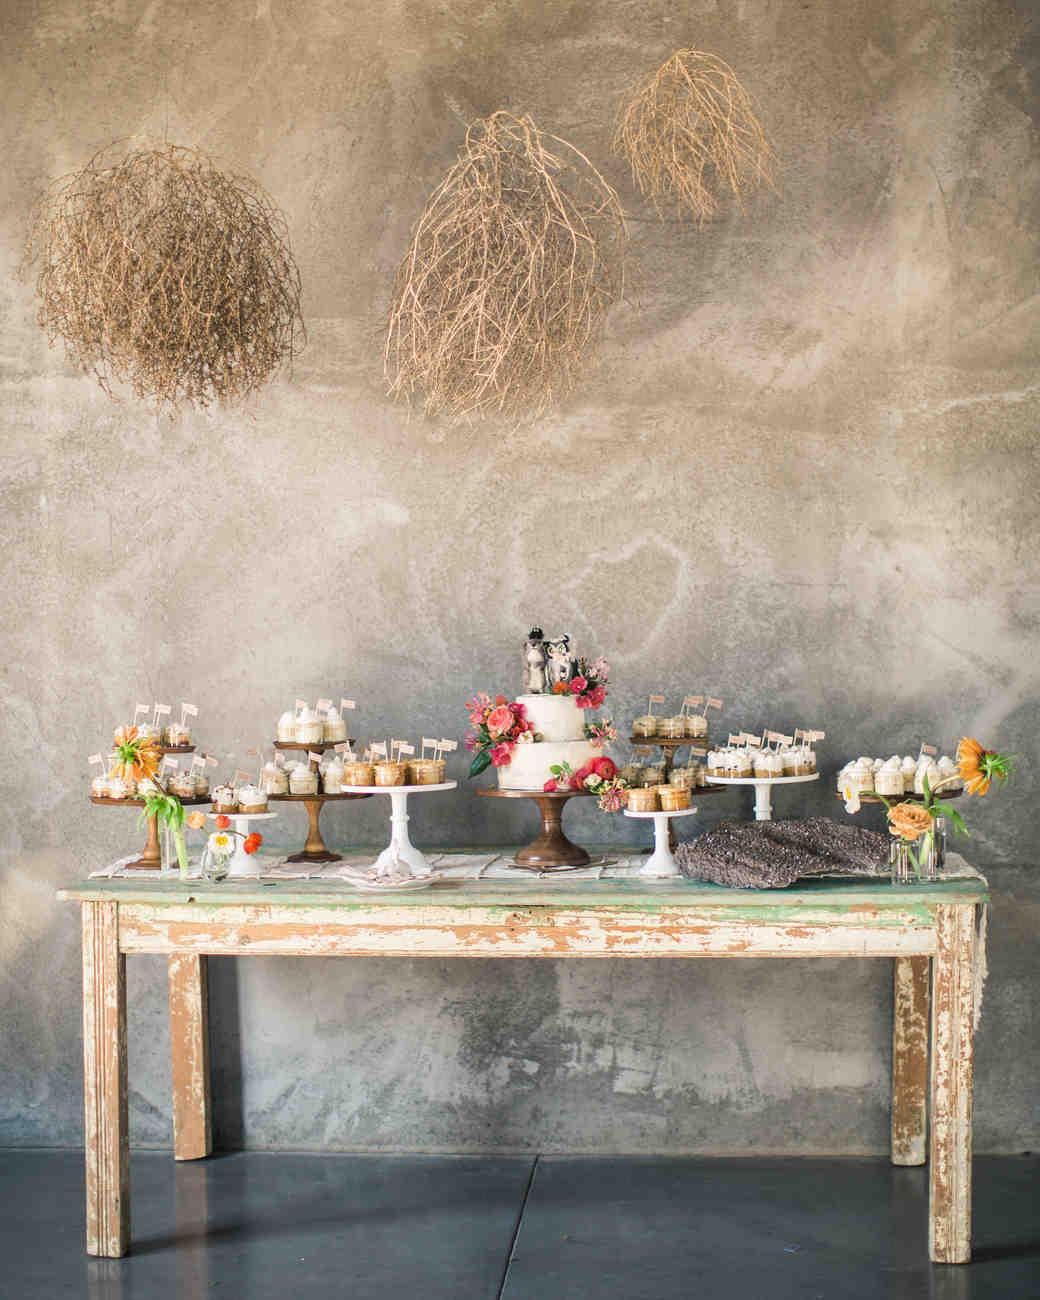 lara-chad-wedding-desserts-158-s112306-1115.jpg